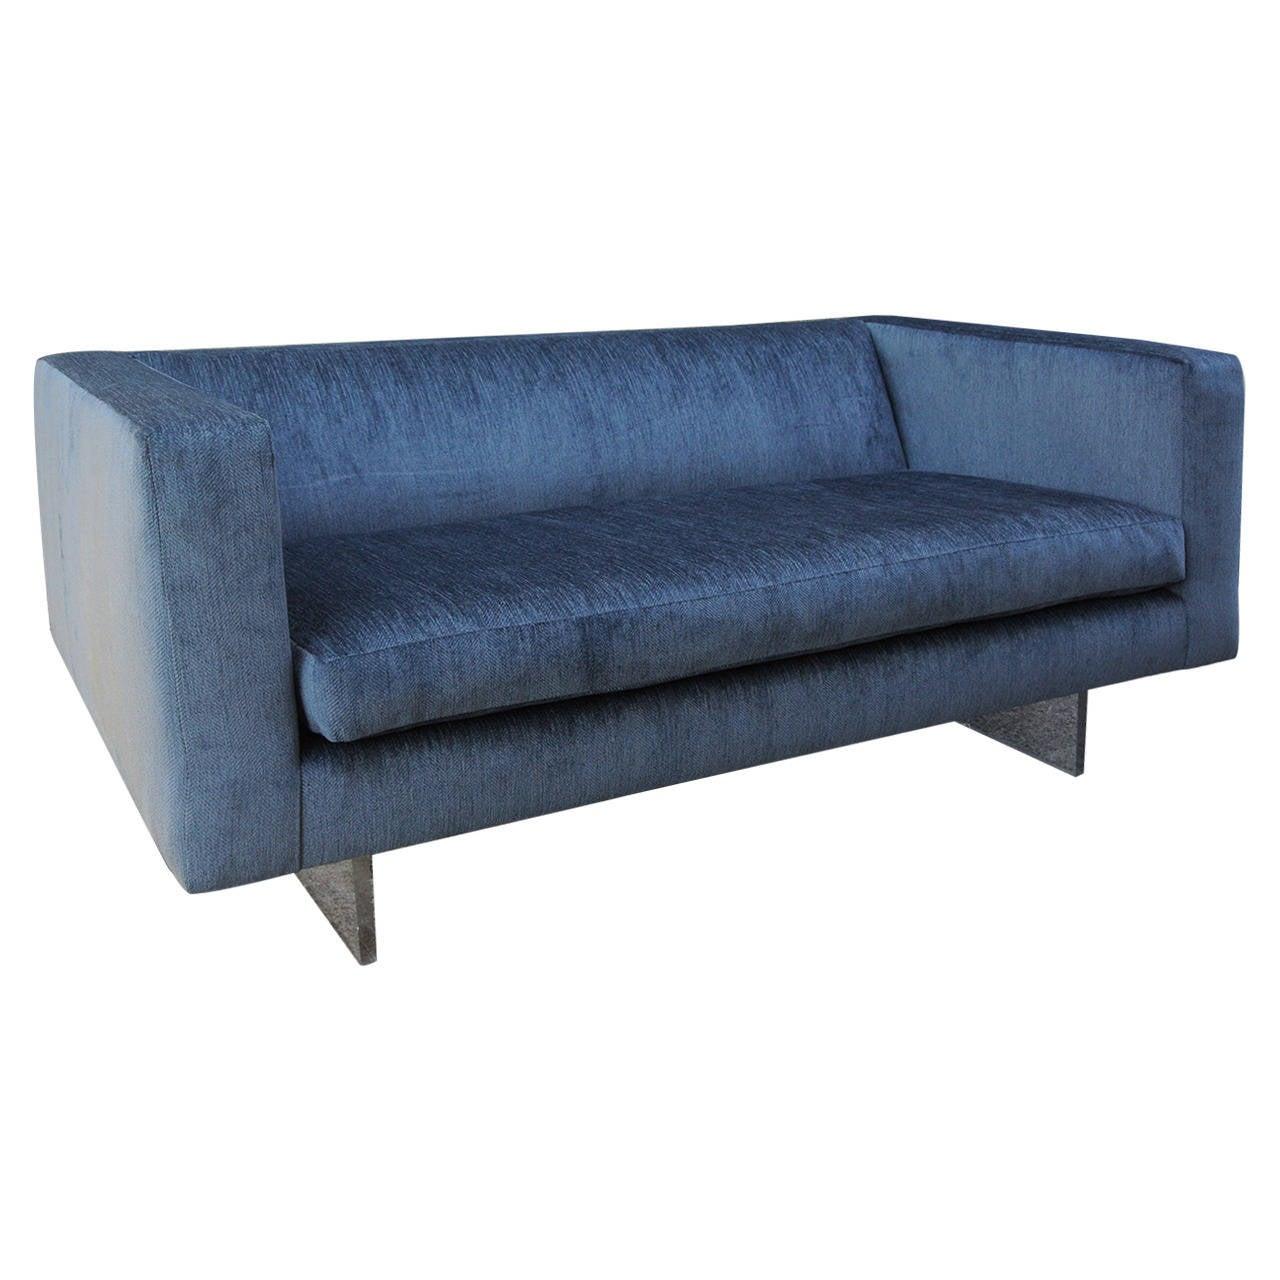 Harvey Probber Sofa on Luctie Base